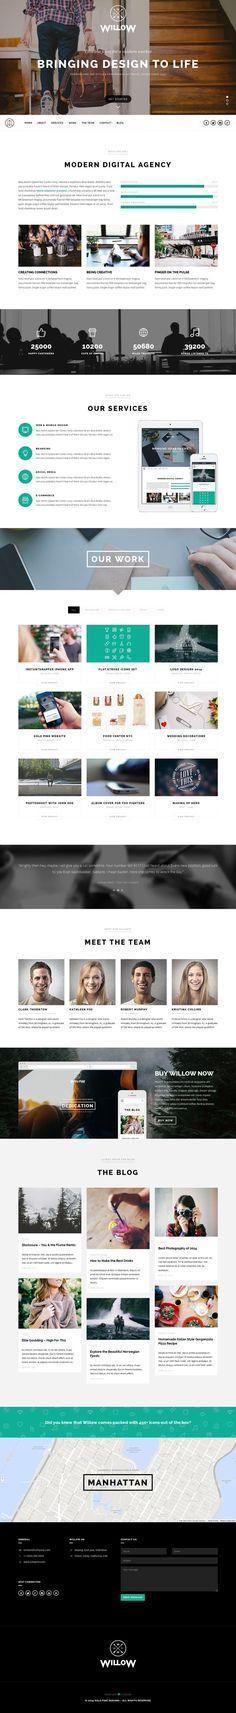 Willow - A One Page Multi-Purpose Theme #web #design